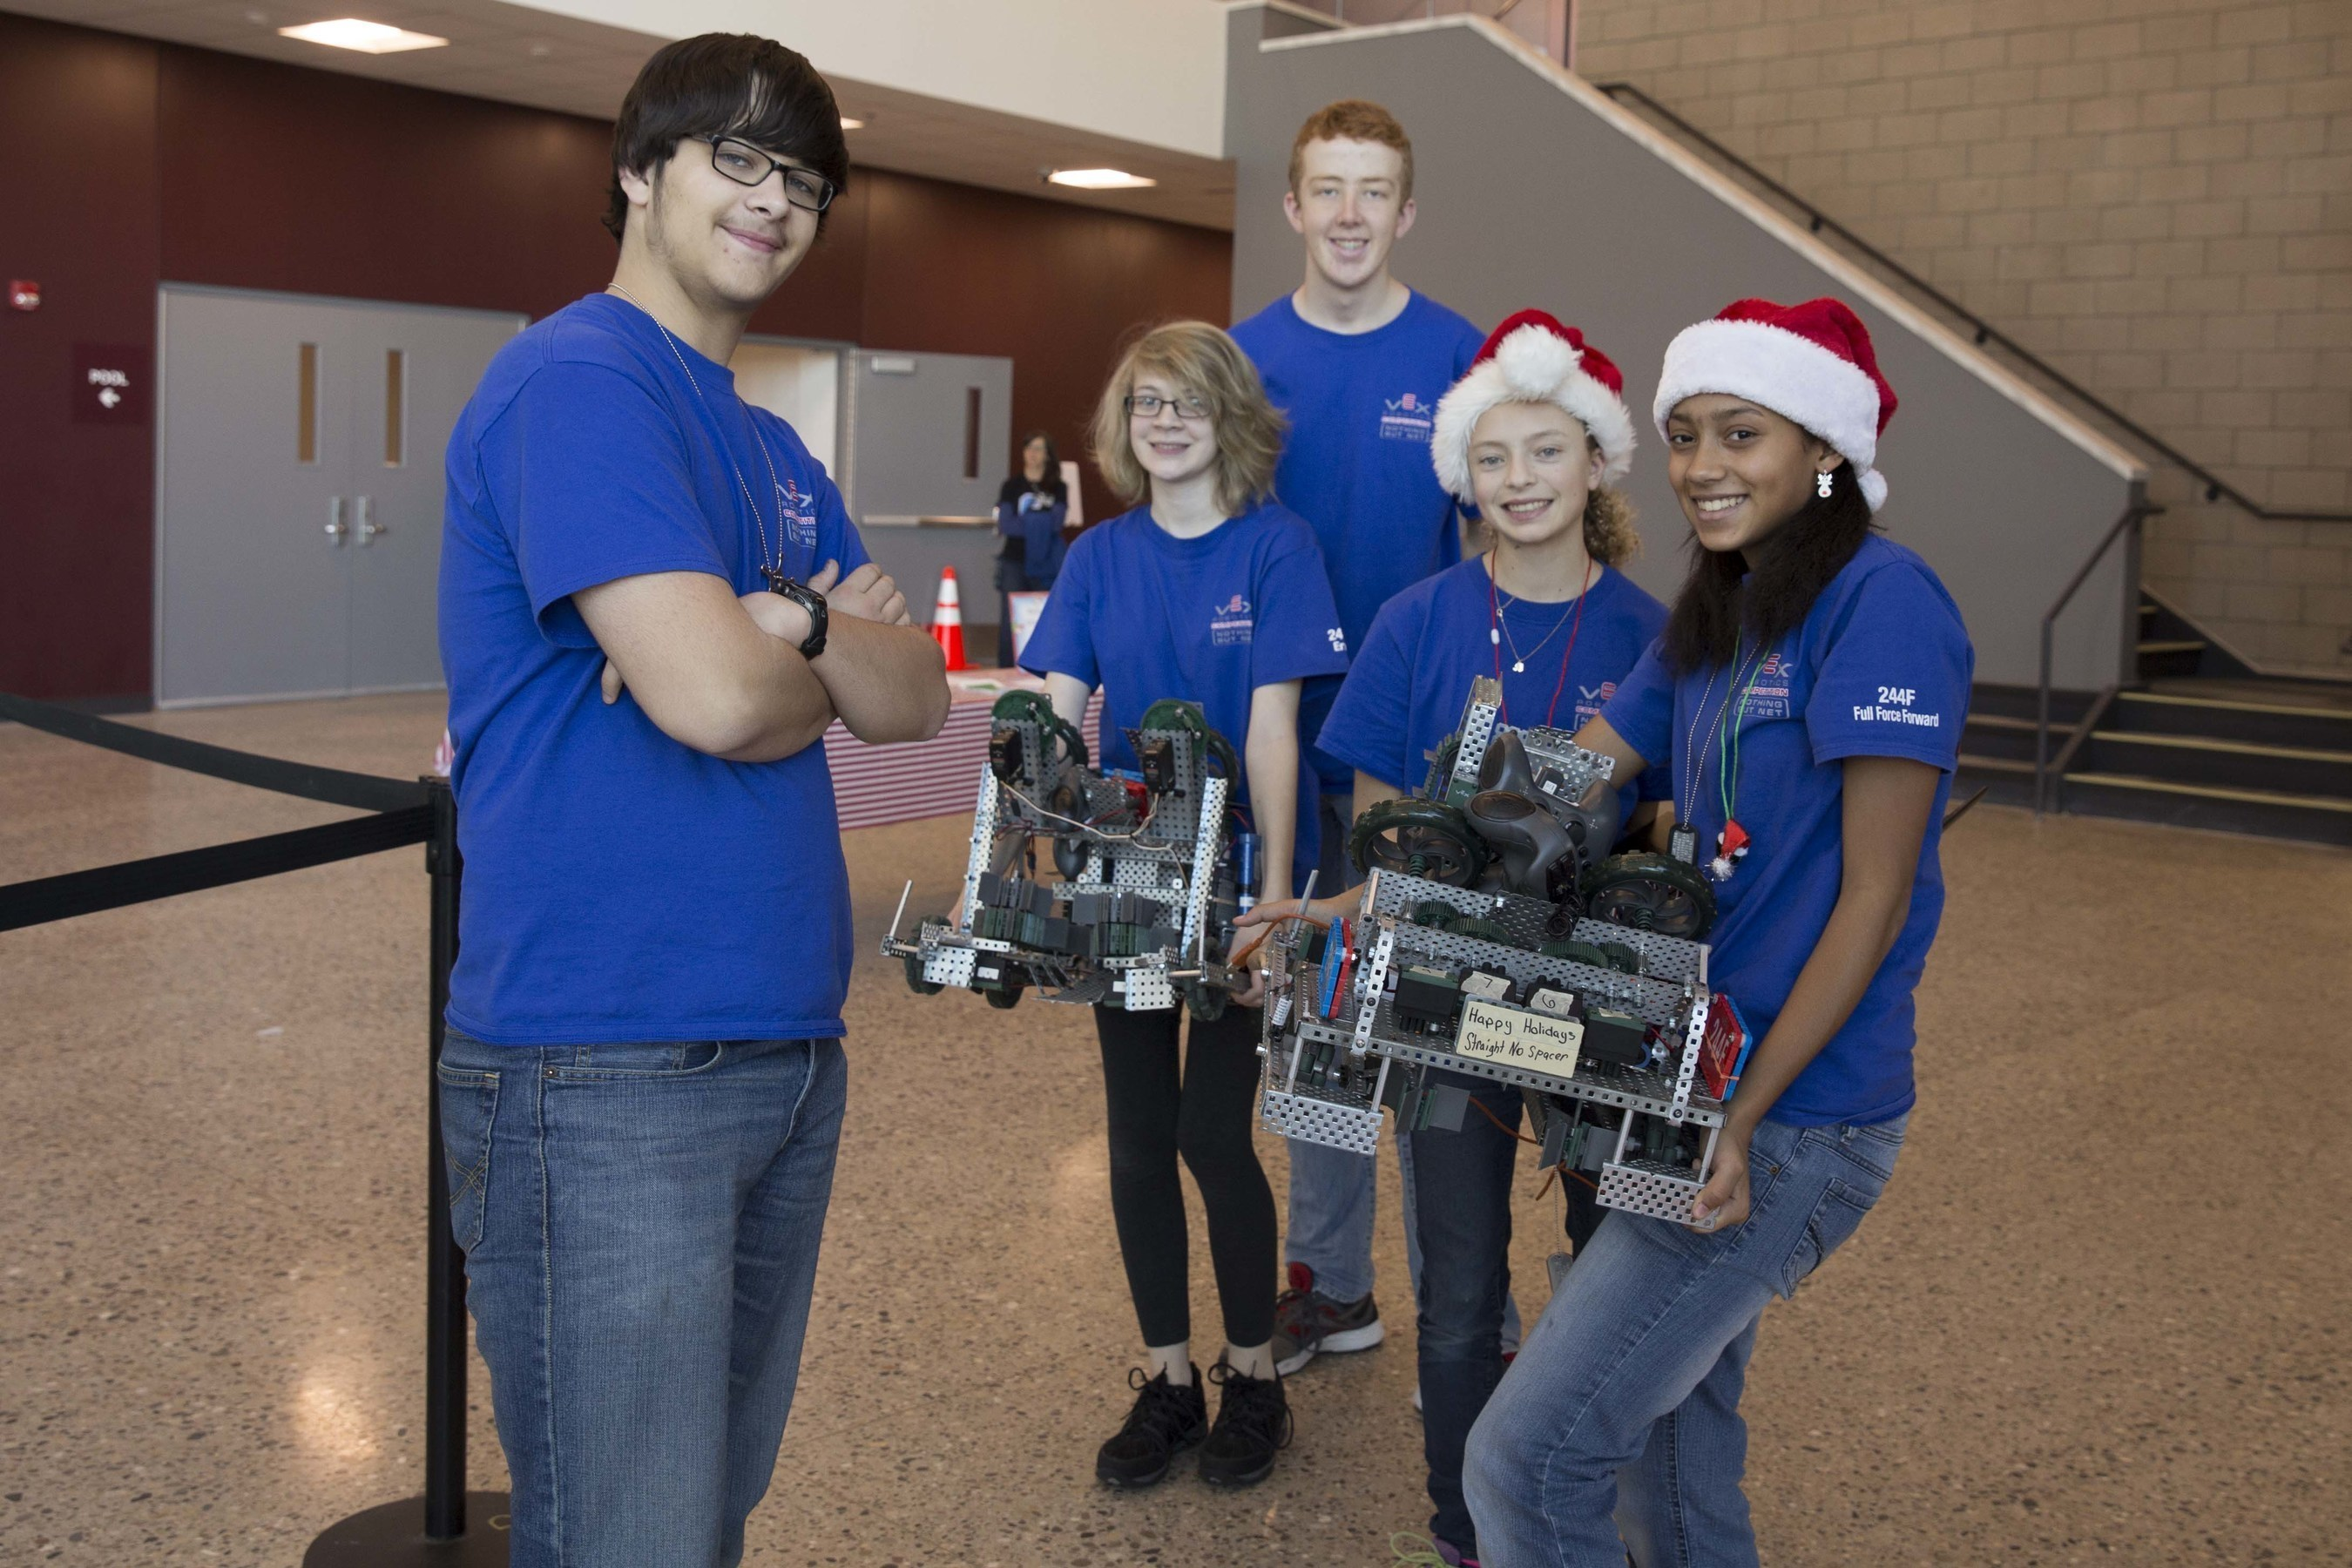 Grandville Public Schools to Host Ten VEX Robotics Competitions - and the first West Michigan Regional VEX Championship